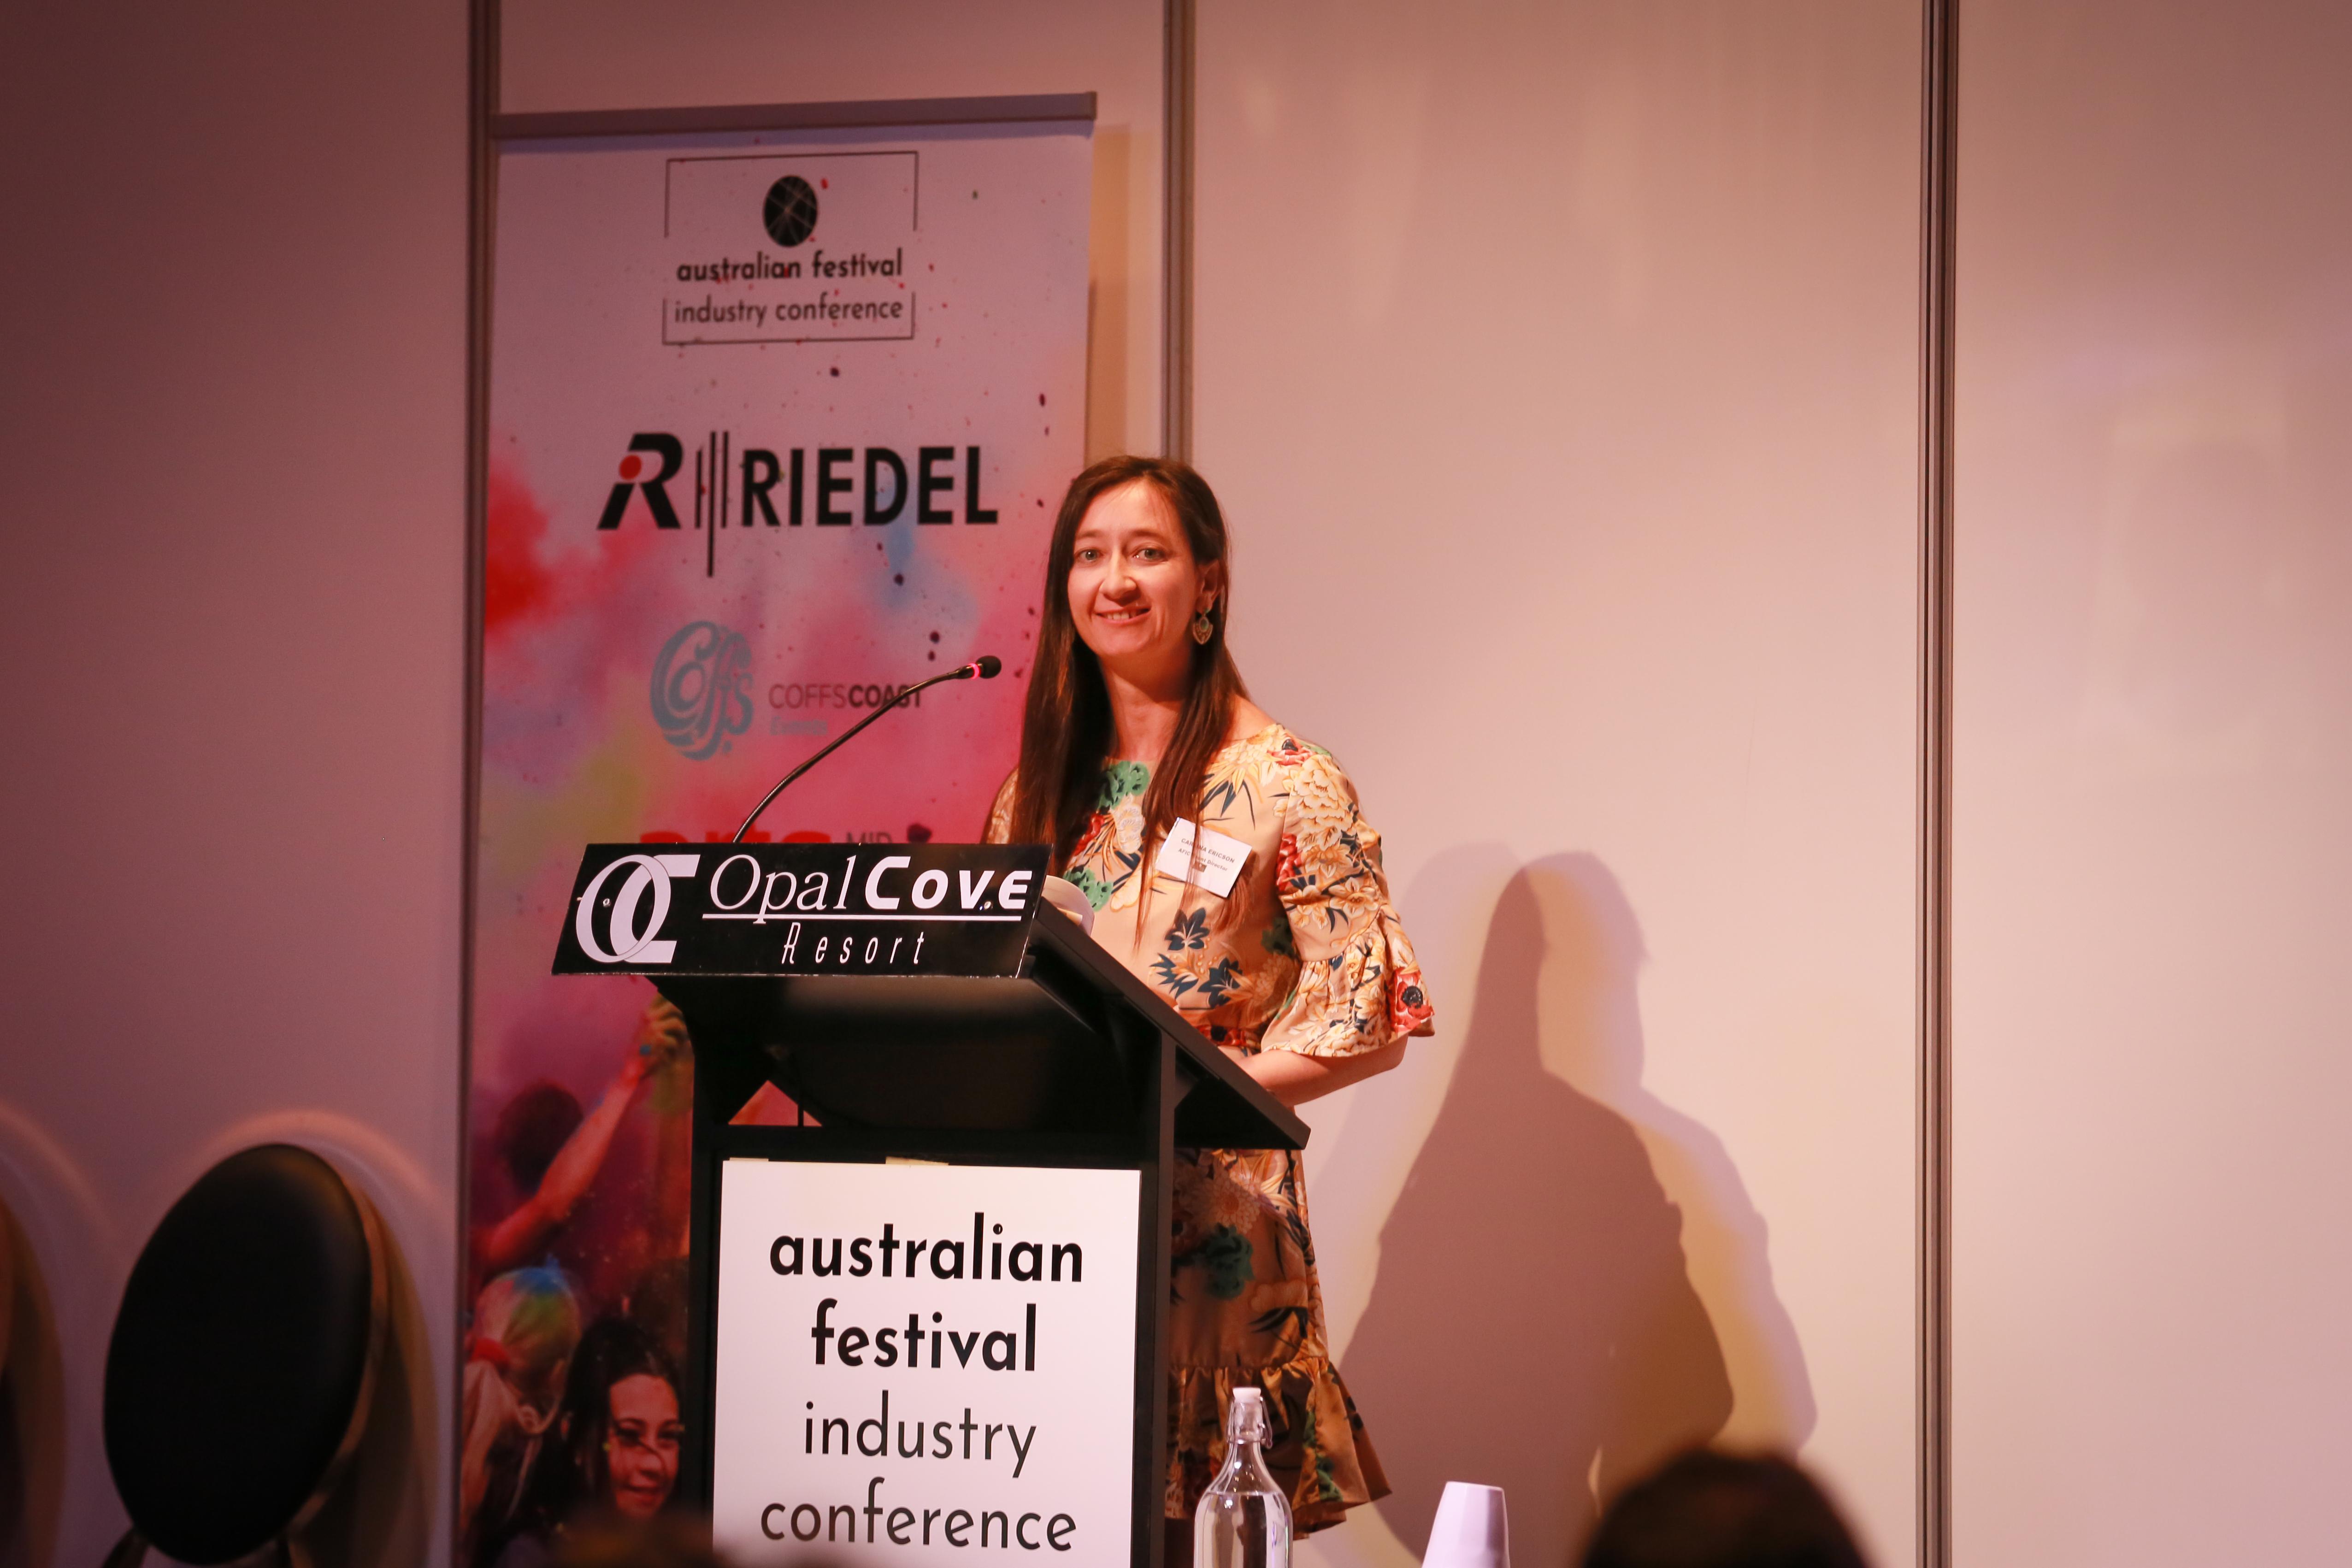 Carlina Ericson, AFIC Founder & Event Director